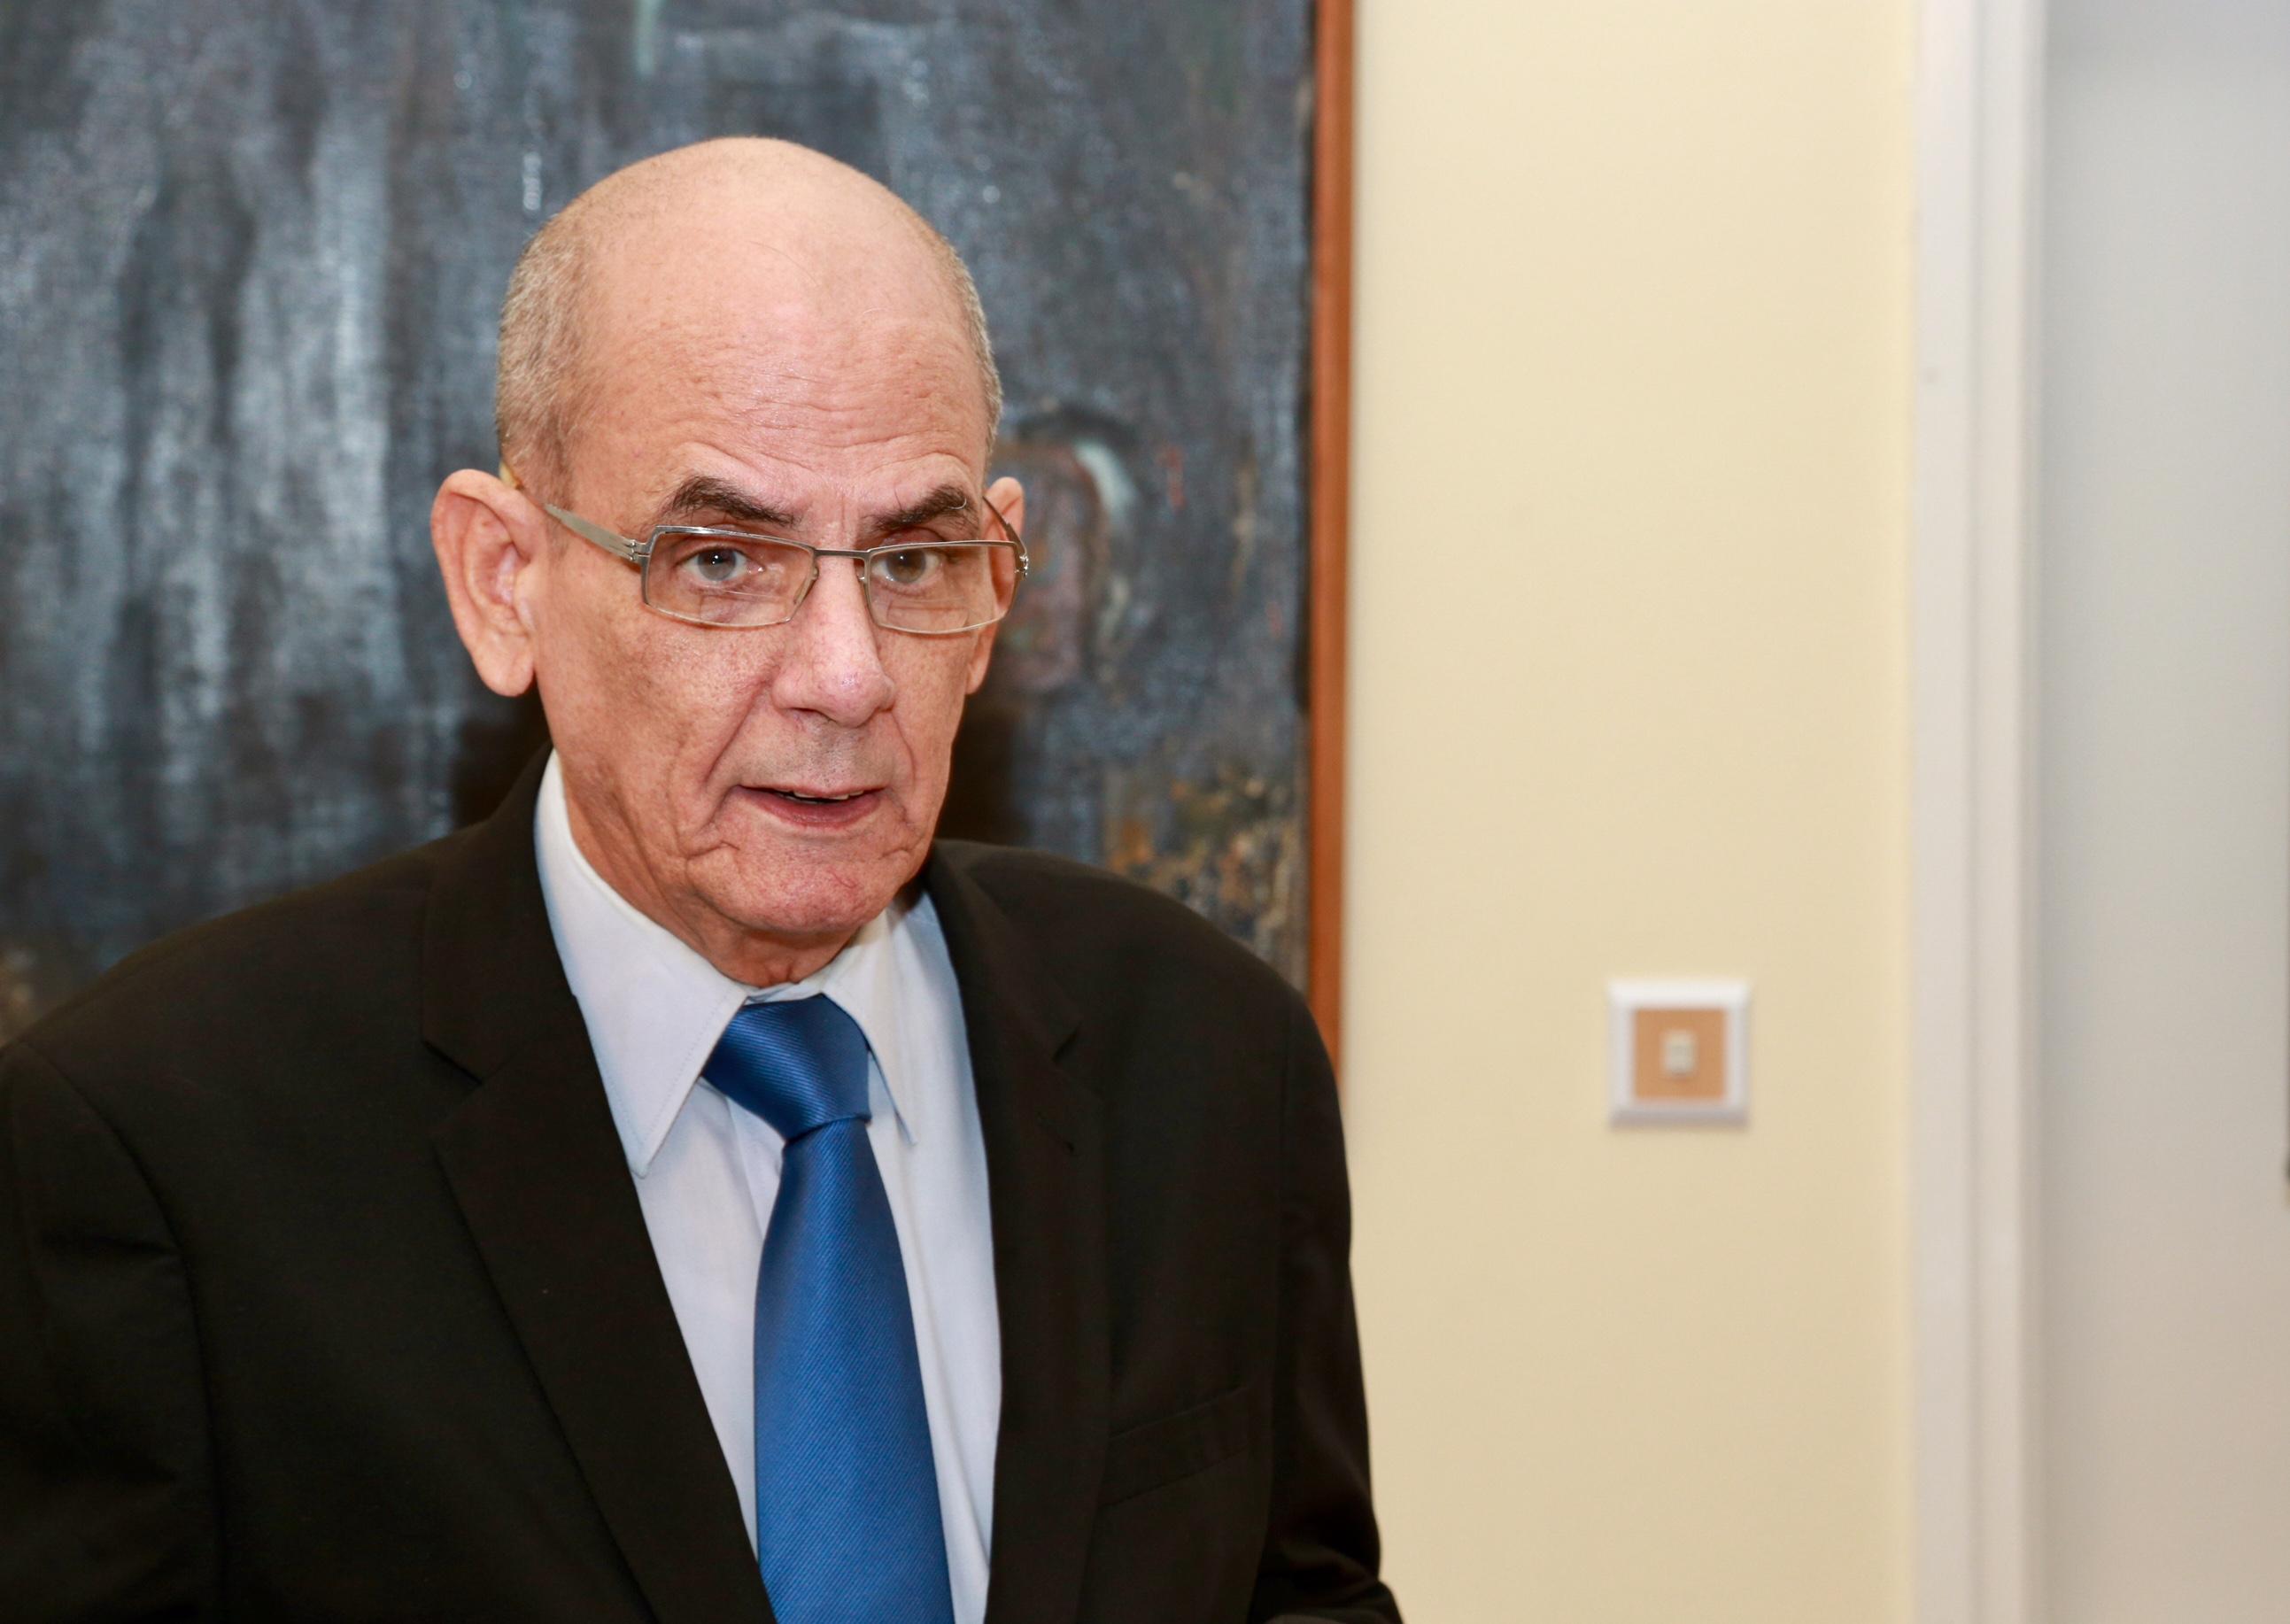 kubai nagykövet.